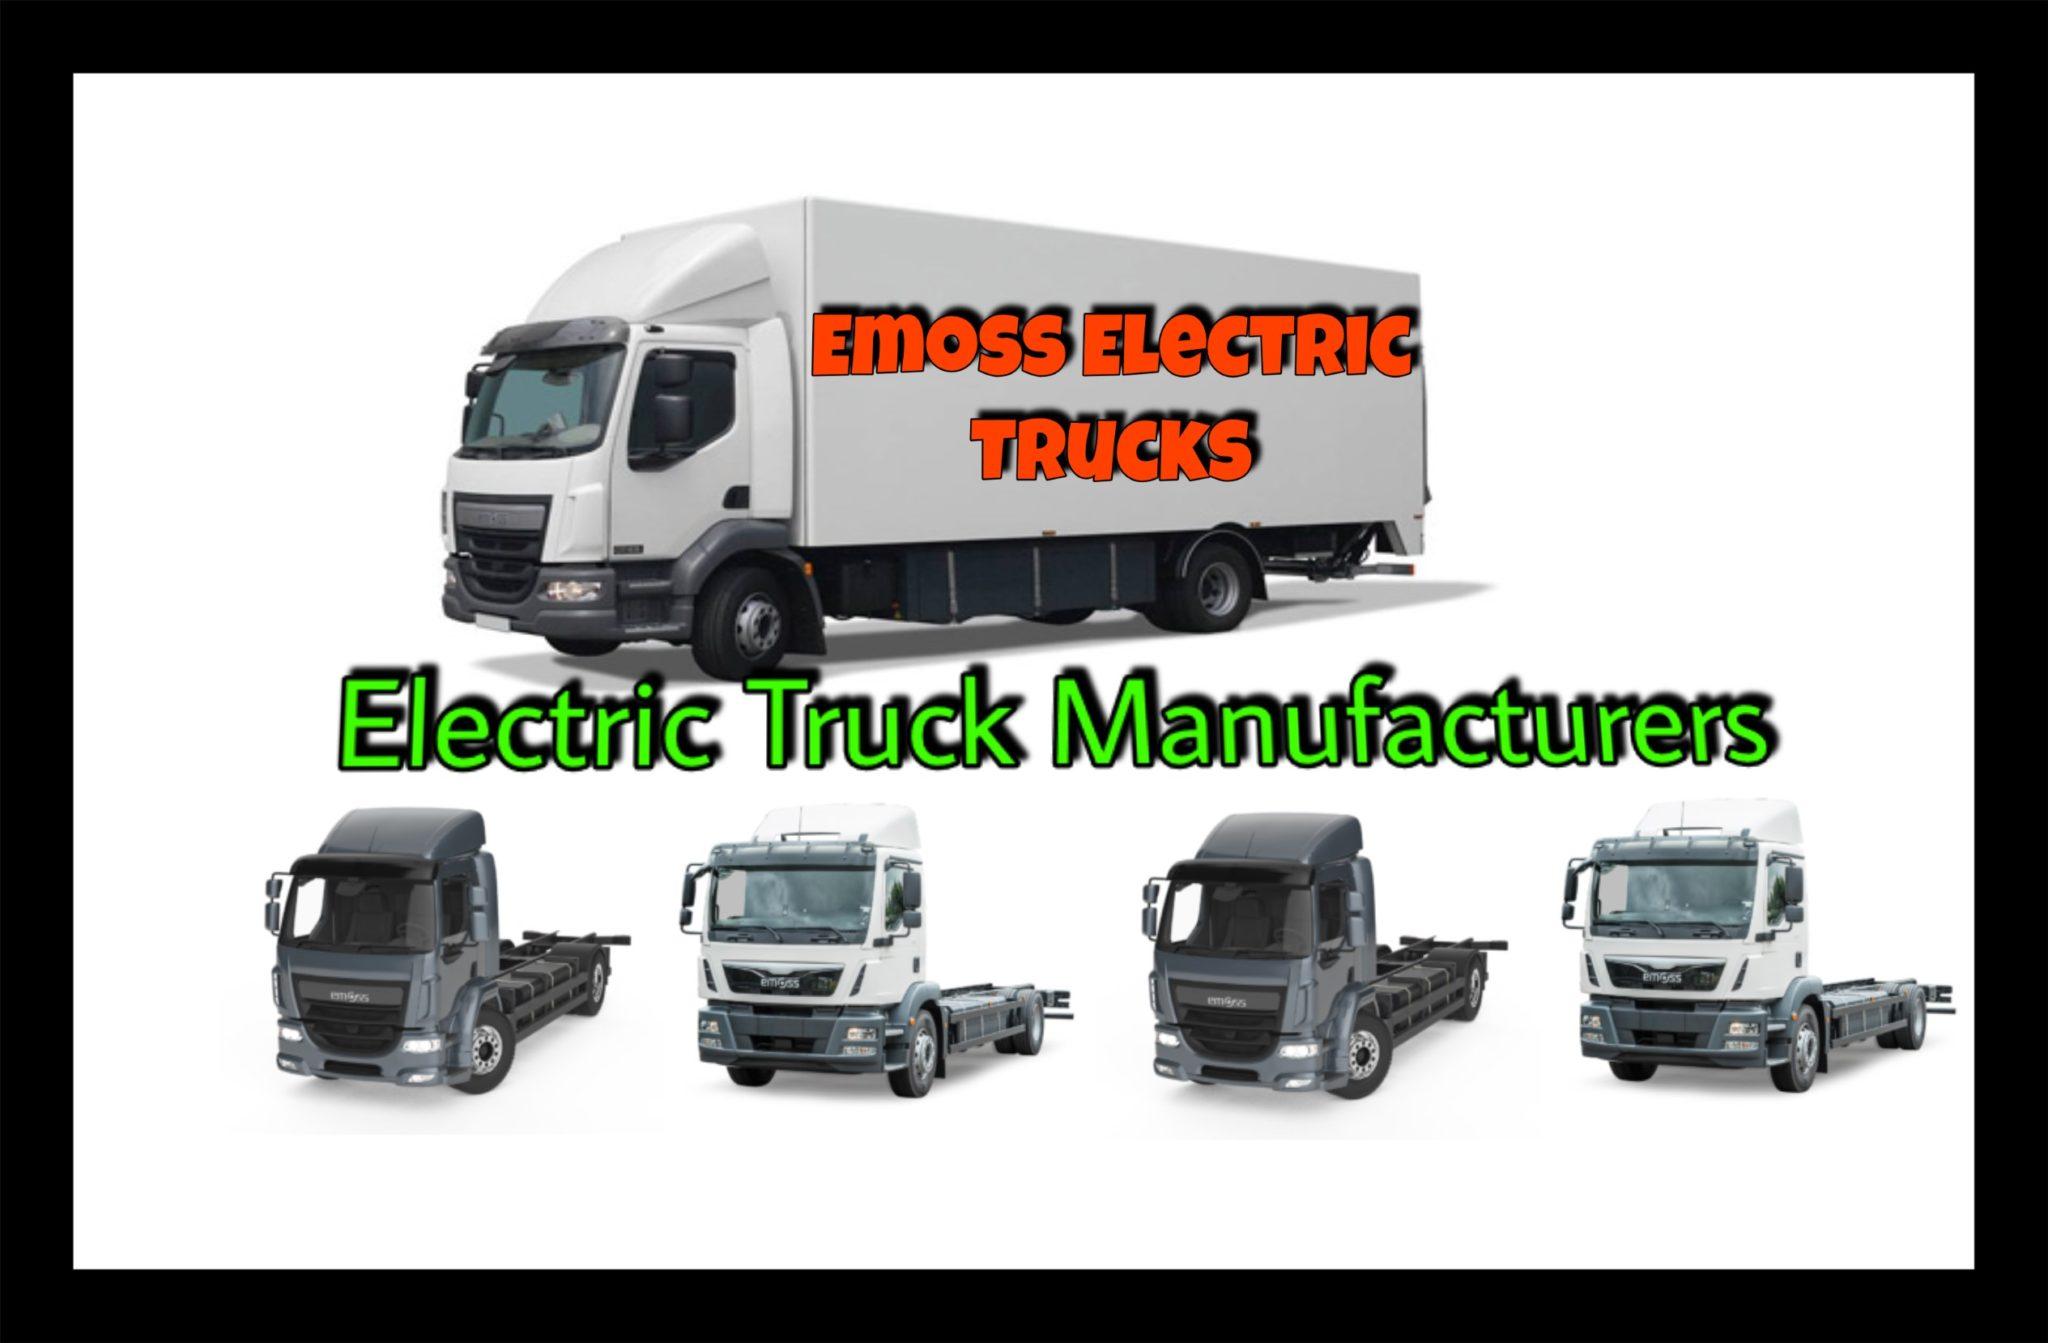 Electric Truck Manufacturers-Emoss Electric Trucks